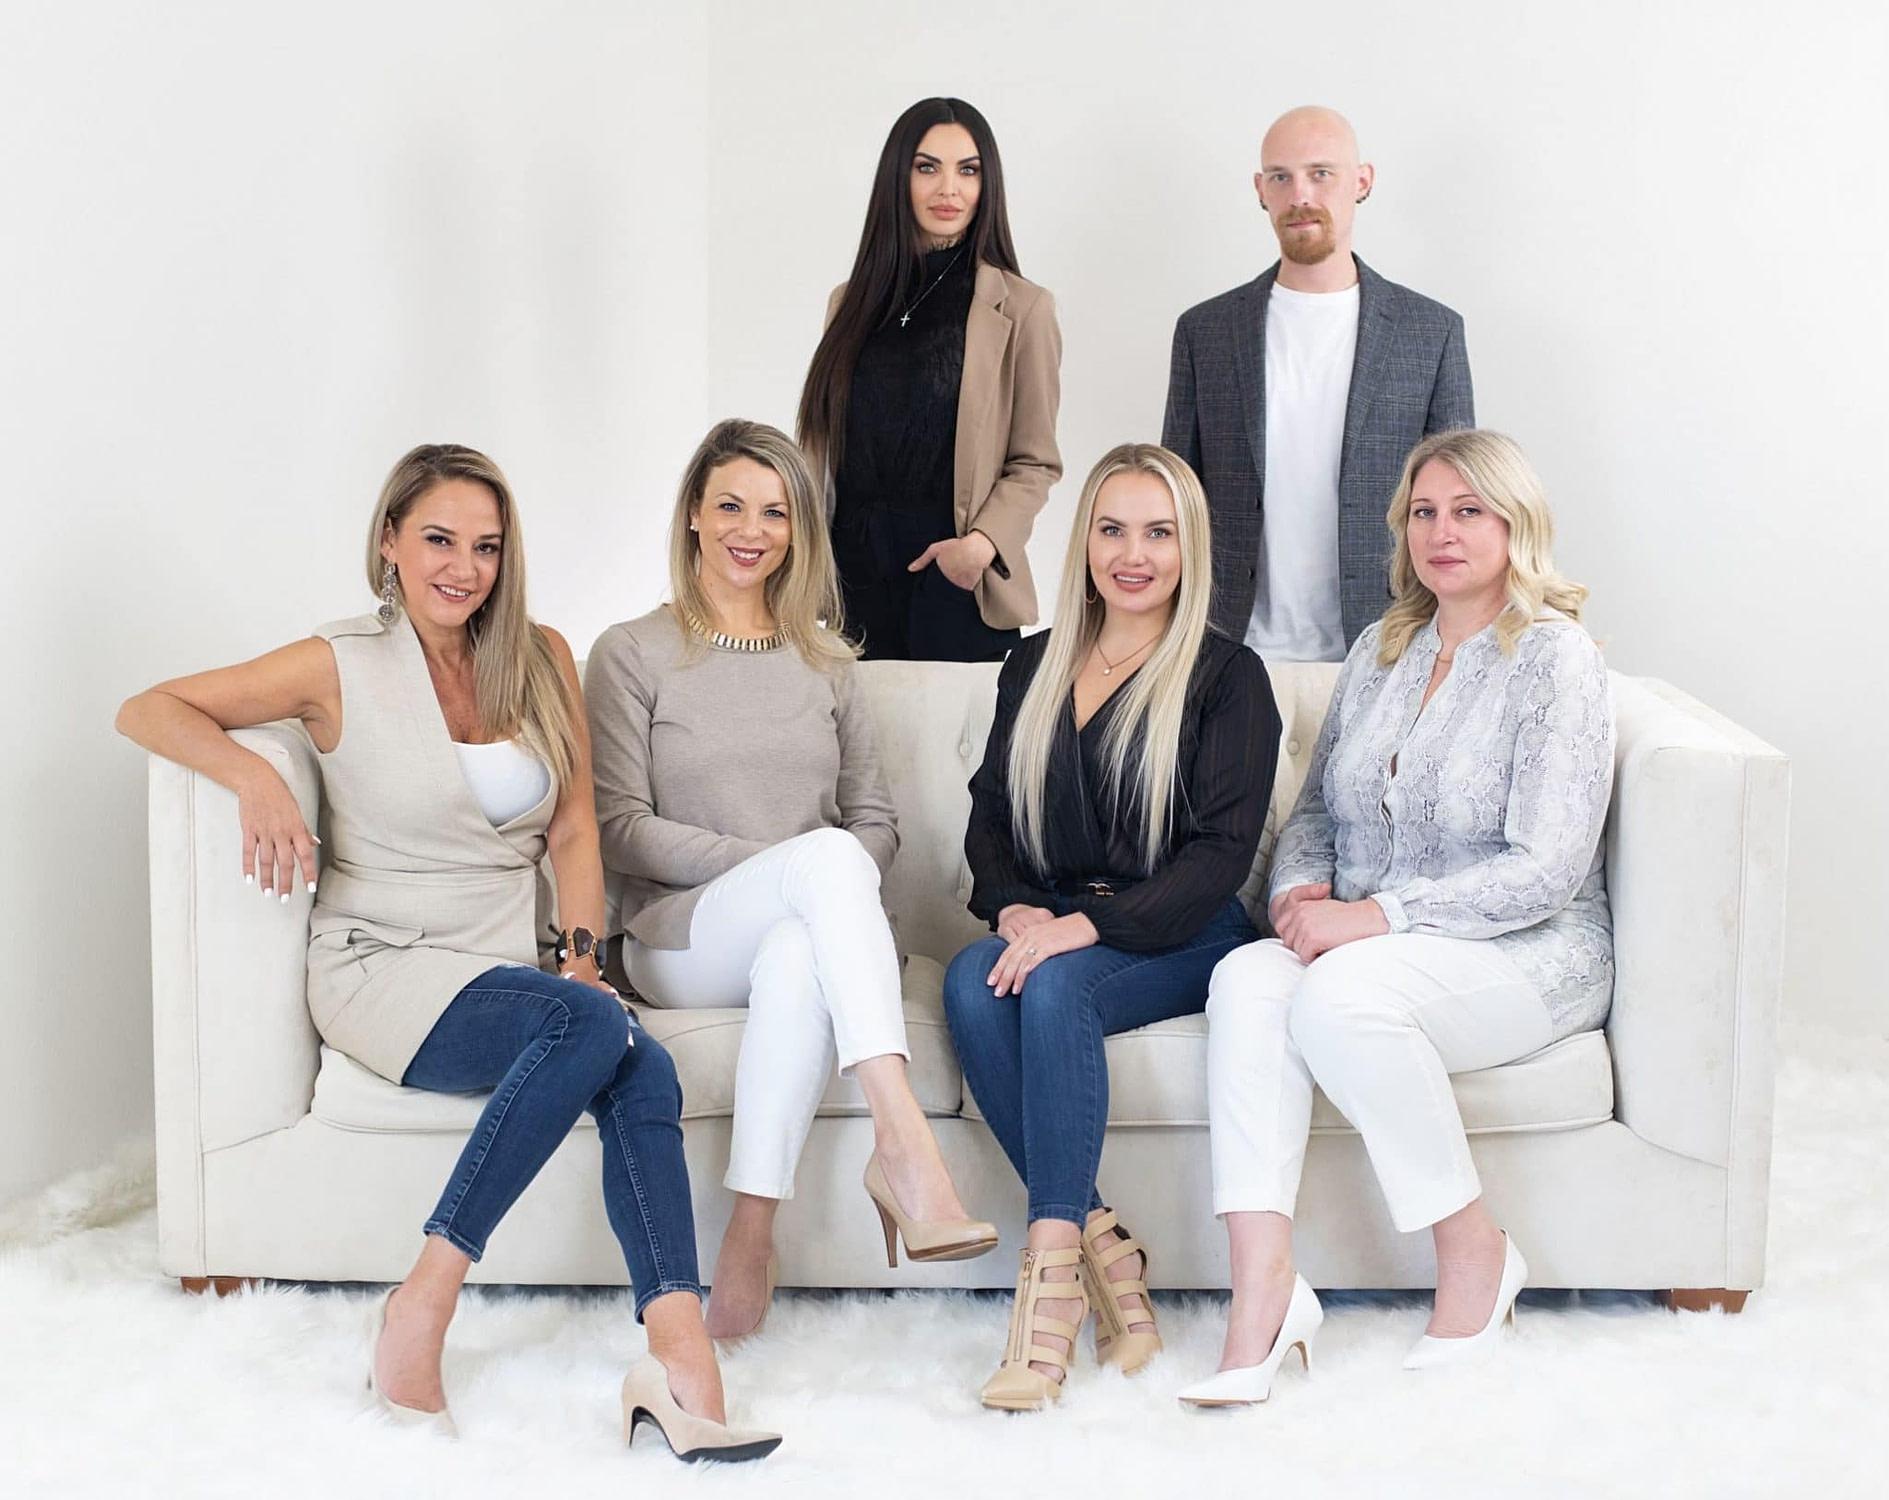 Home decorating and interior design team